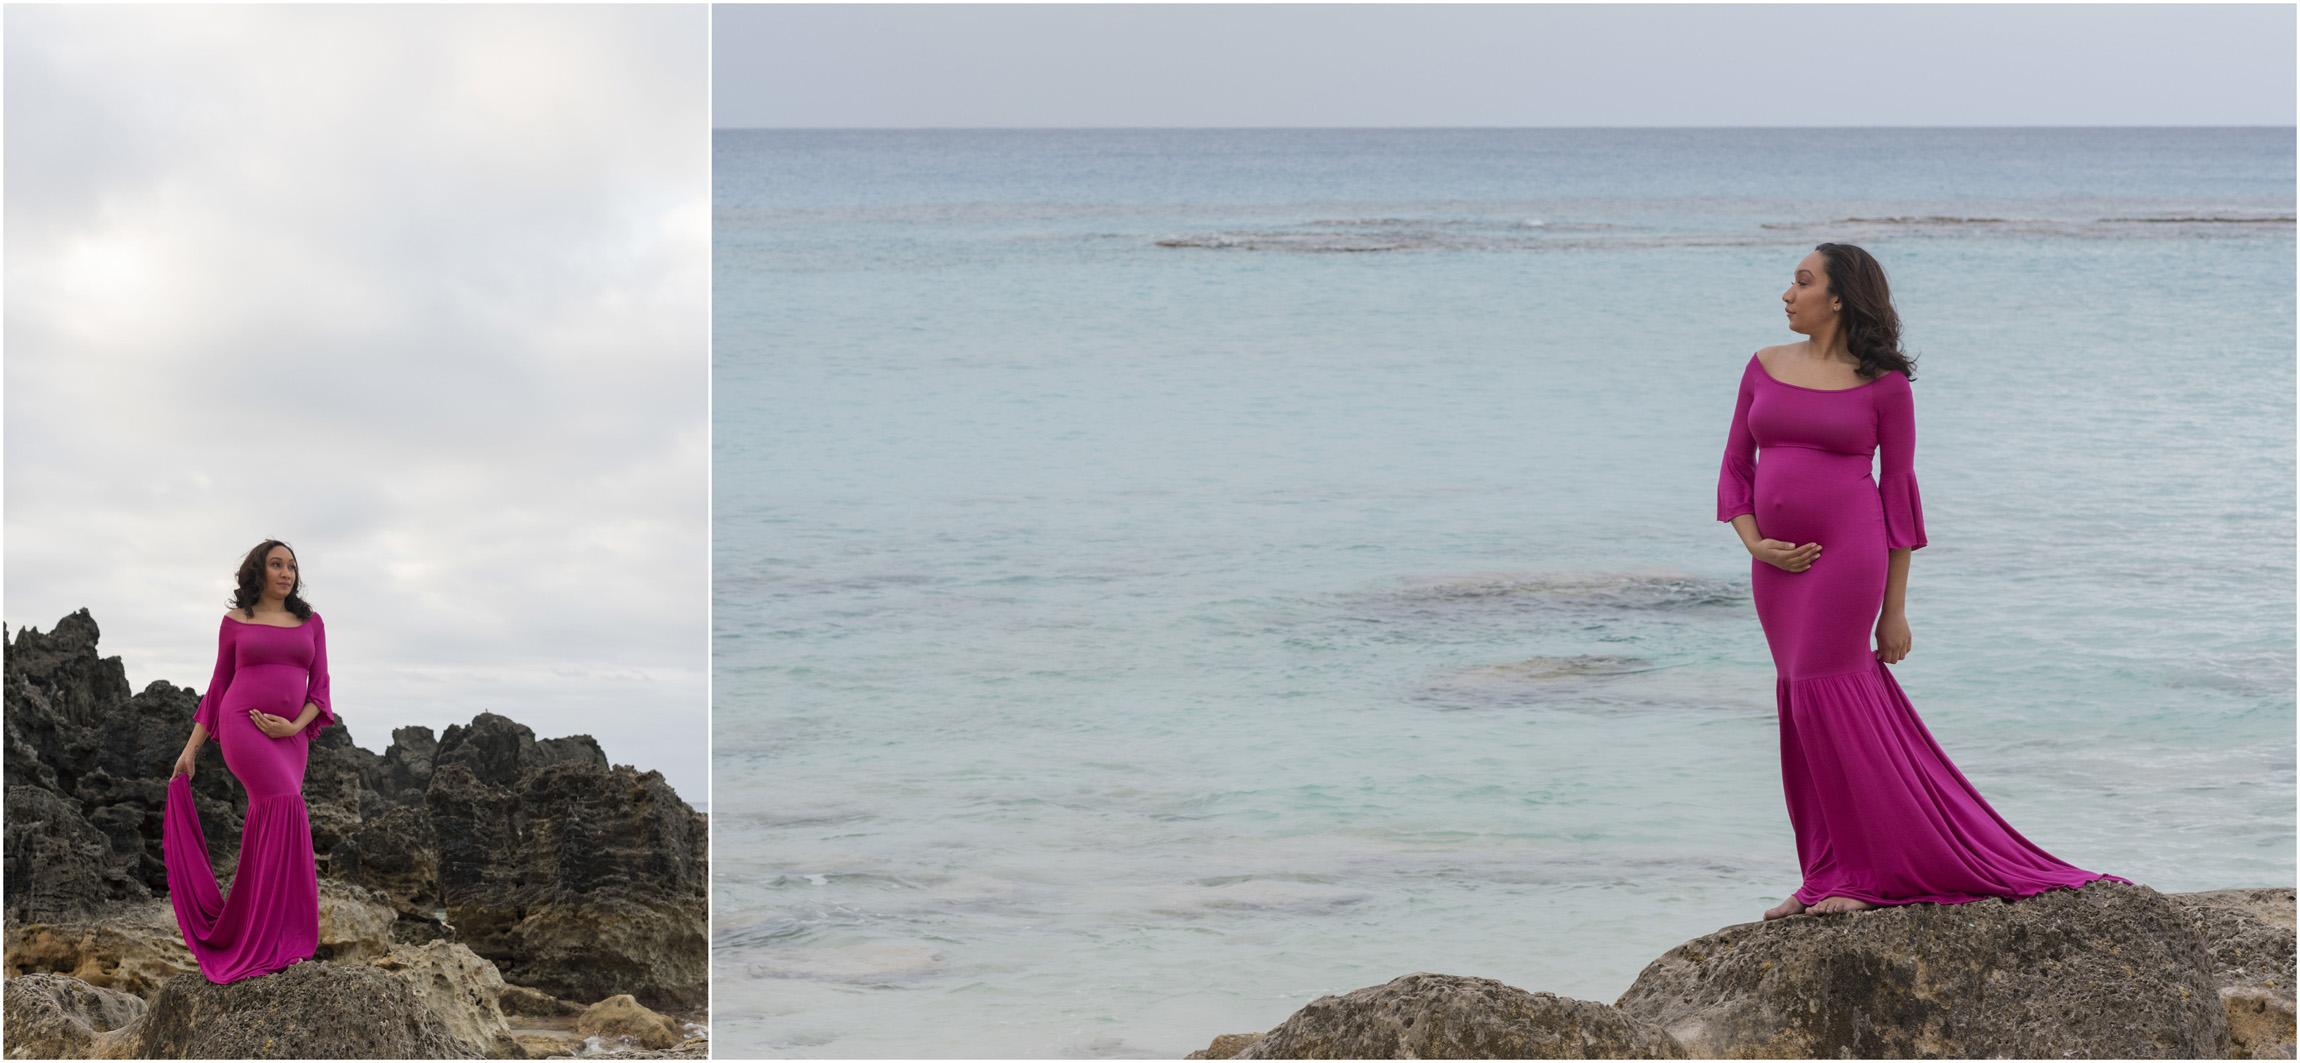 ©FianderFoto_Bermuda Maternity Photographer_Church Bay Beach_Tiffany_004.jpg